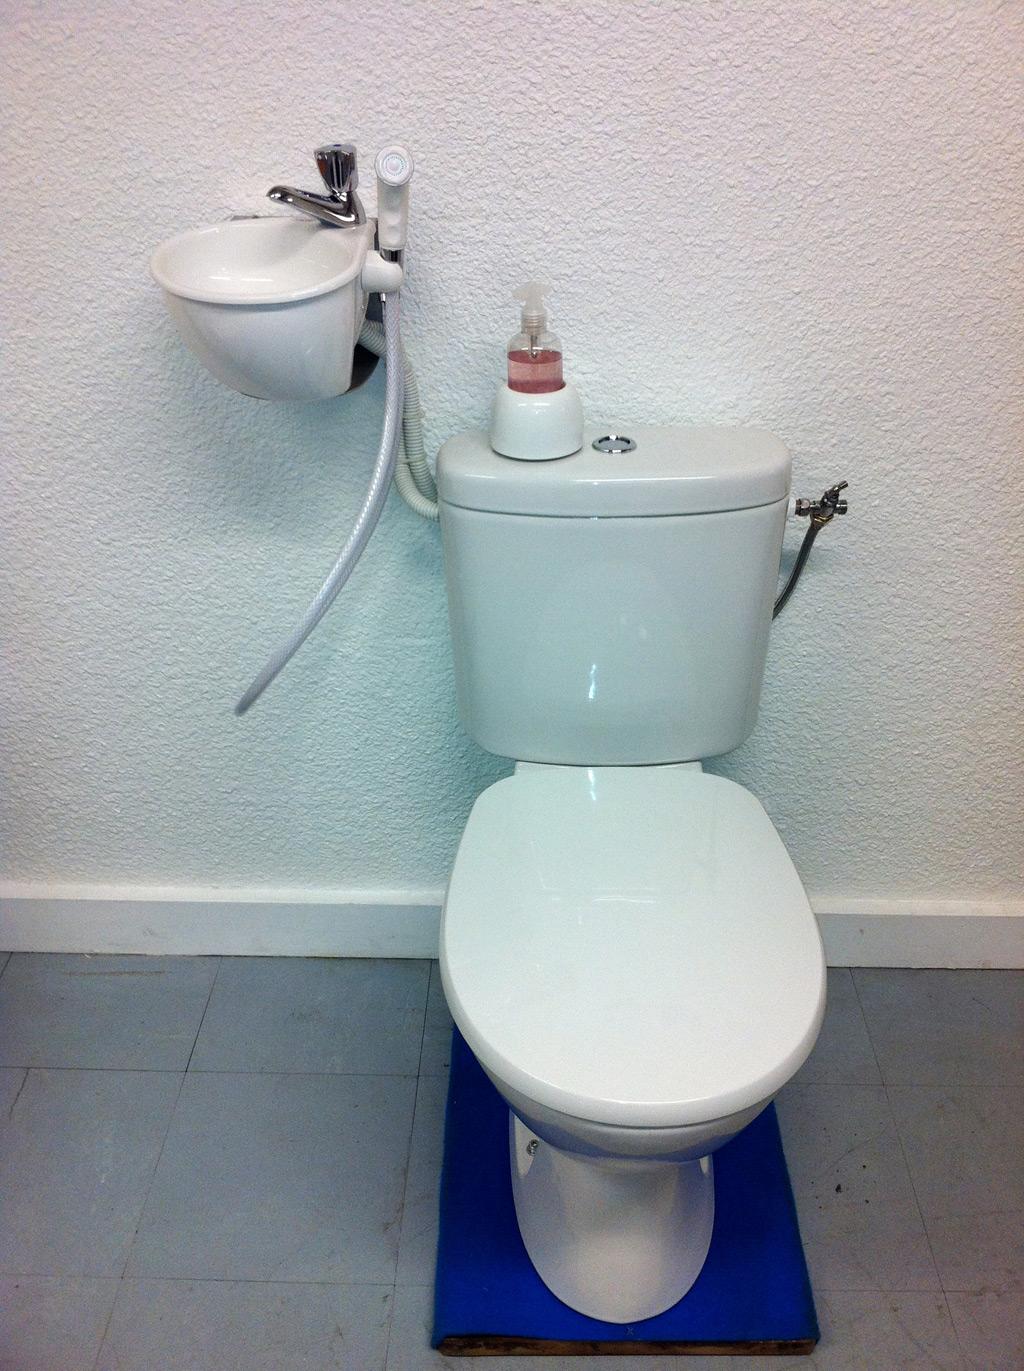 Mini Dusche Wc : WiCi Jdid, das WiCi Mini mit Handbrause – Atelier Cr?ation JF (25